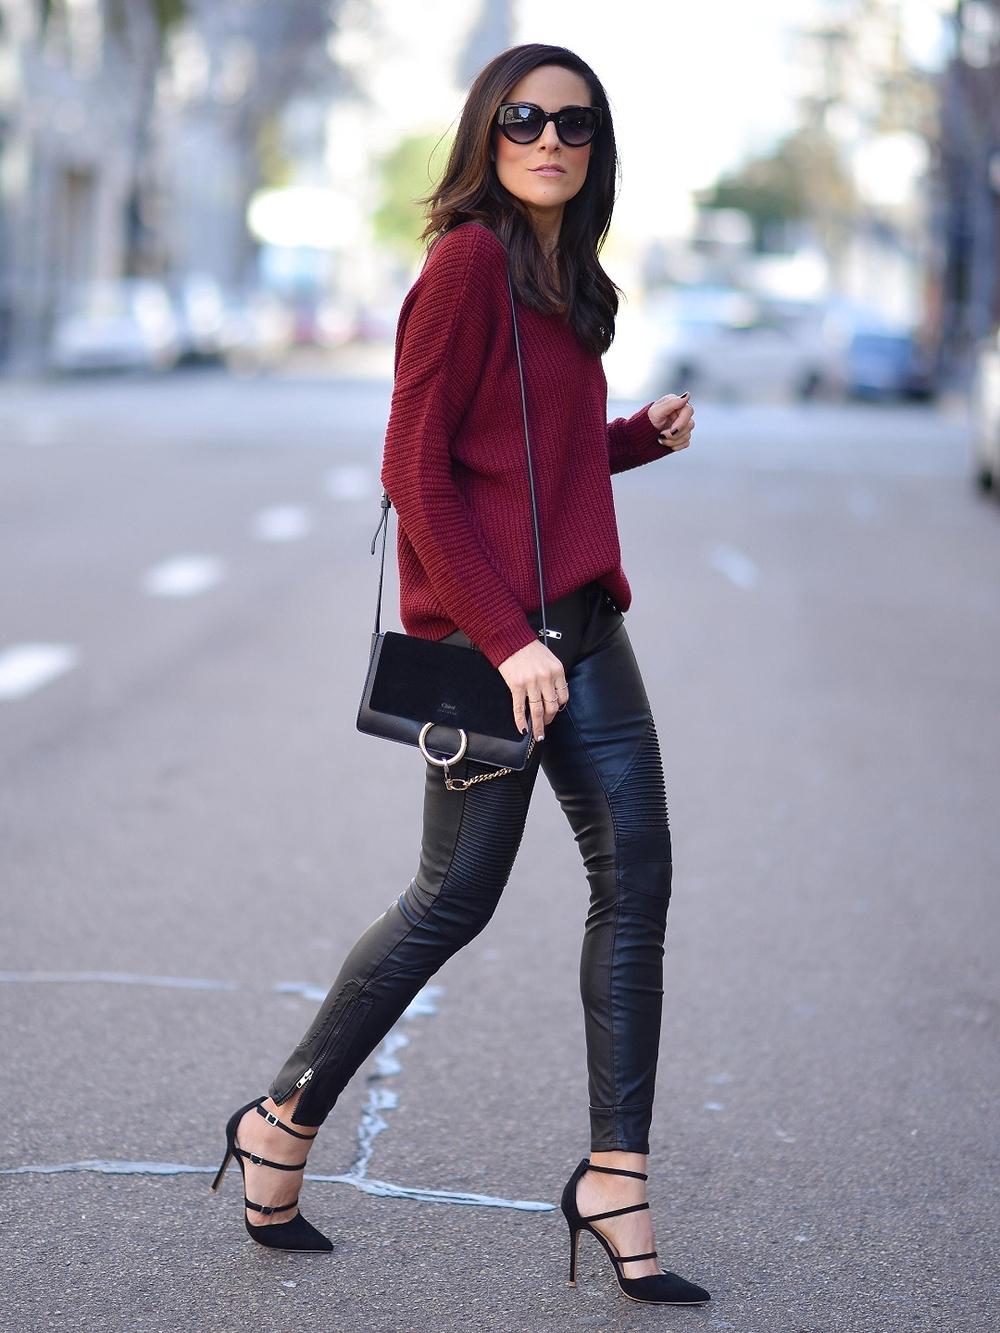 BlankNYC_Chloe_Faye_ShopForever21_SimplyKasia_Streetstyle_LucysWhims_Topshop.jpg